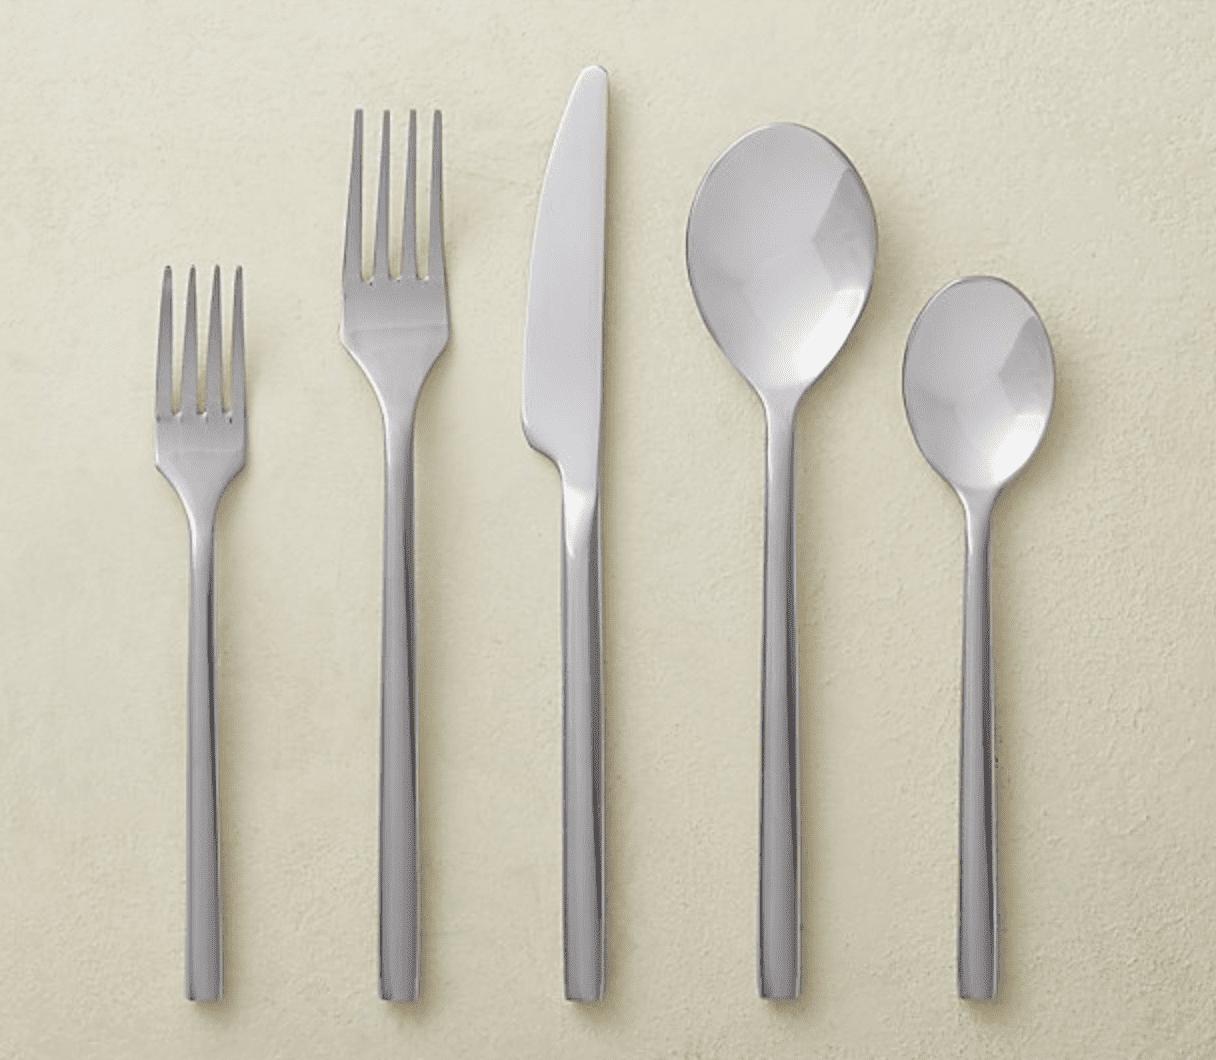 20-piece Rush Shiny Silver Flatware Set